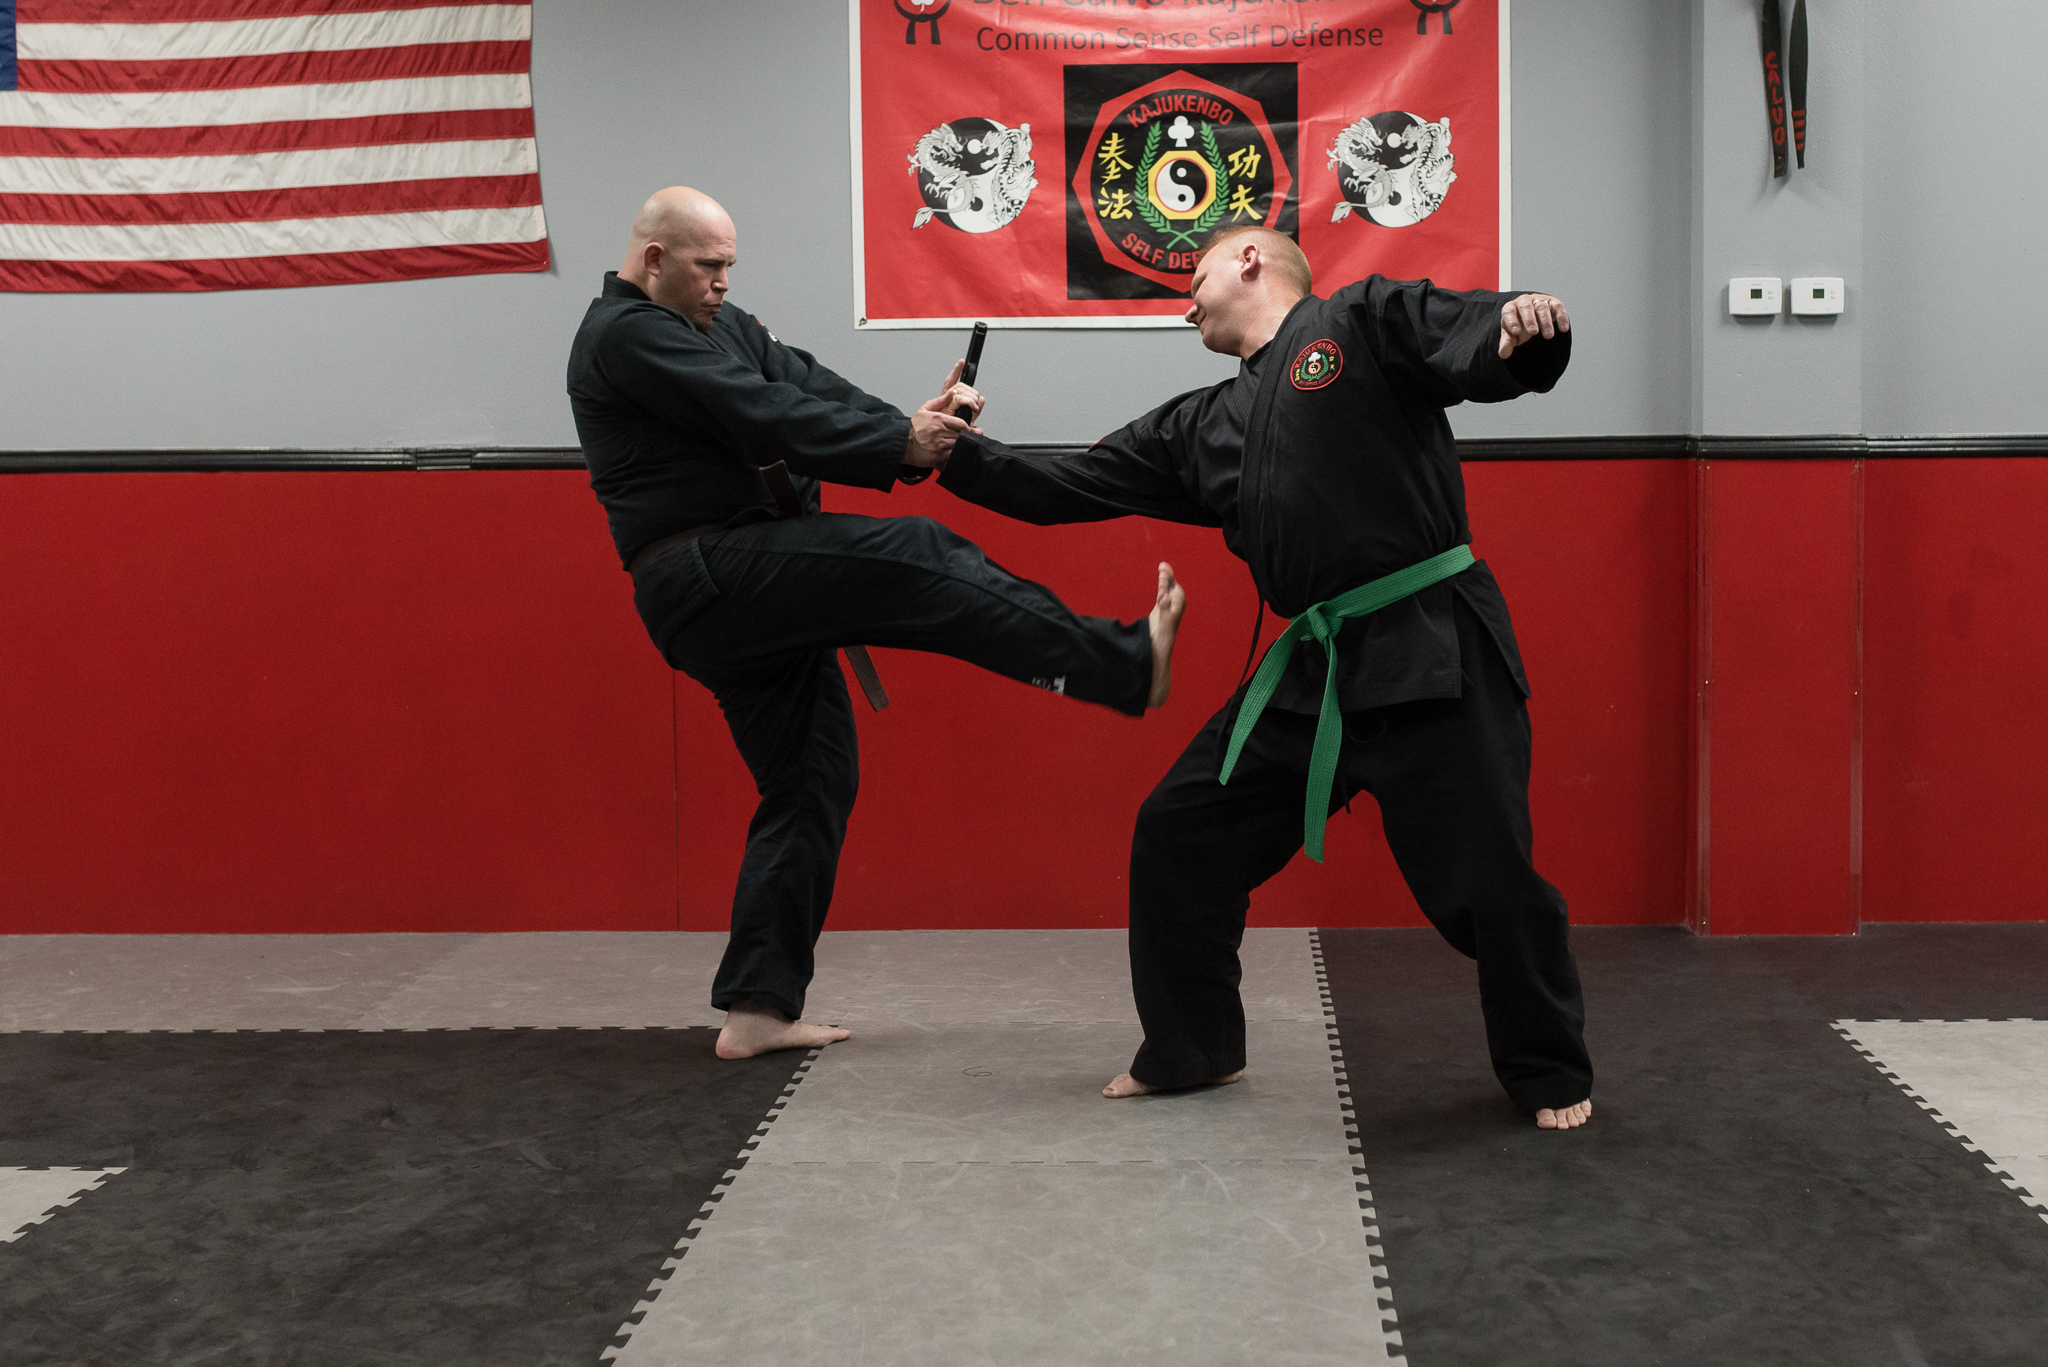 Austin and Round Rock Commercial Photography - Emily Ingalls Photography - Sports and Fitness Photography - Martial Arts Taekwondo Kajukenbo Photography-2.jpg